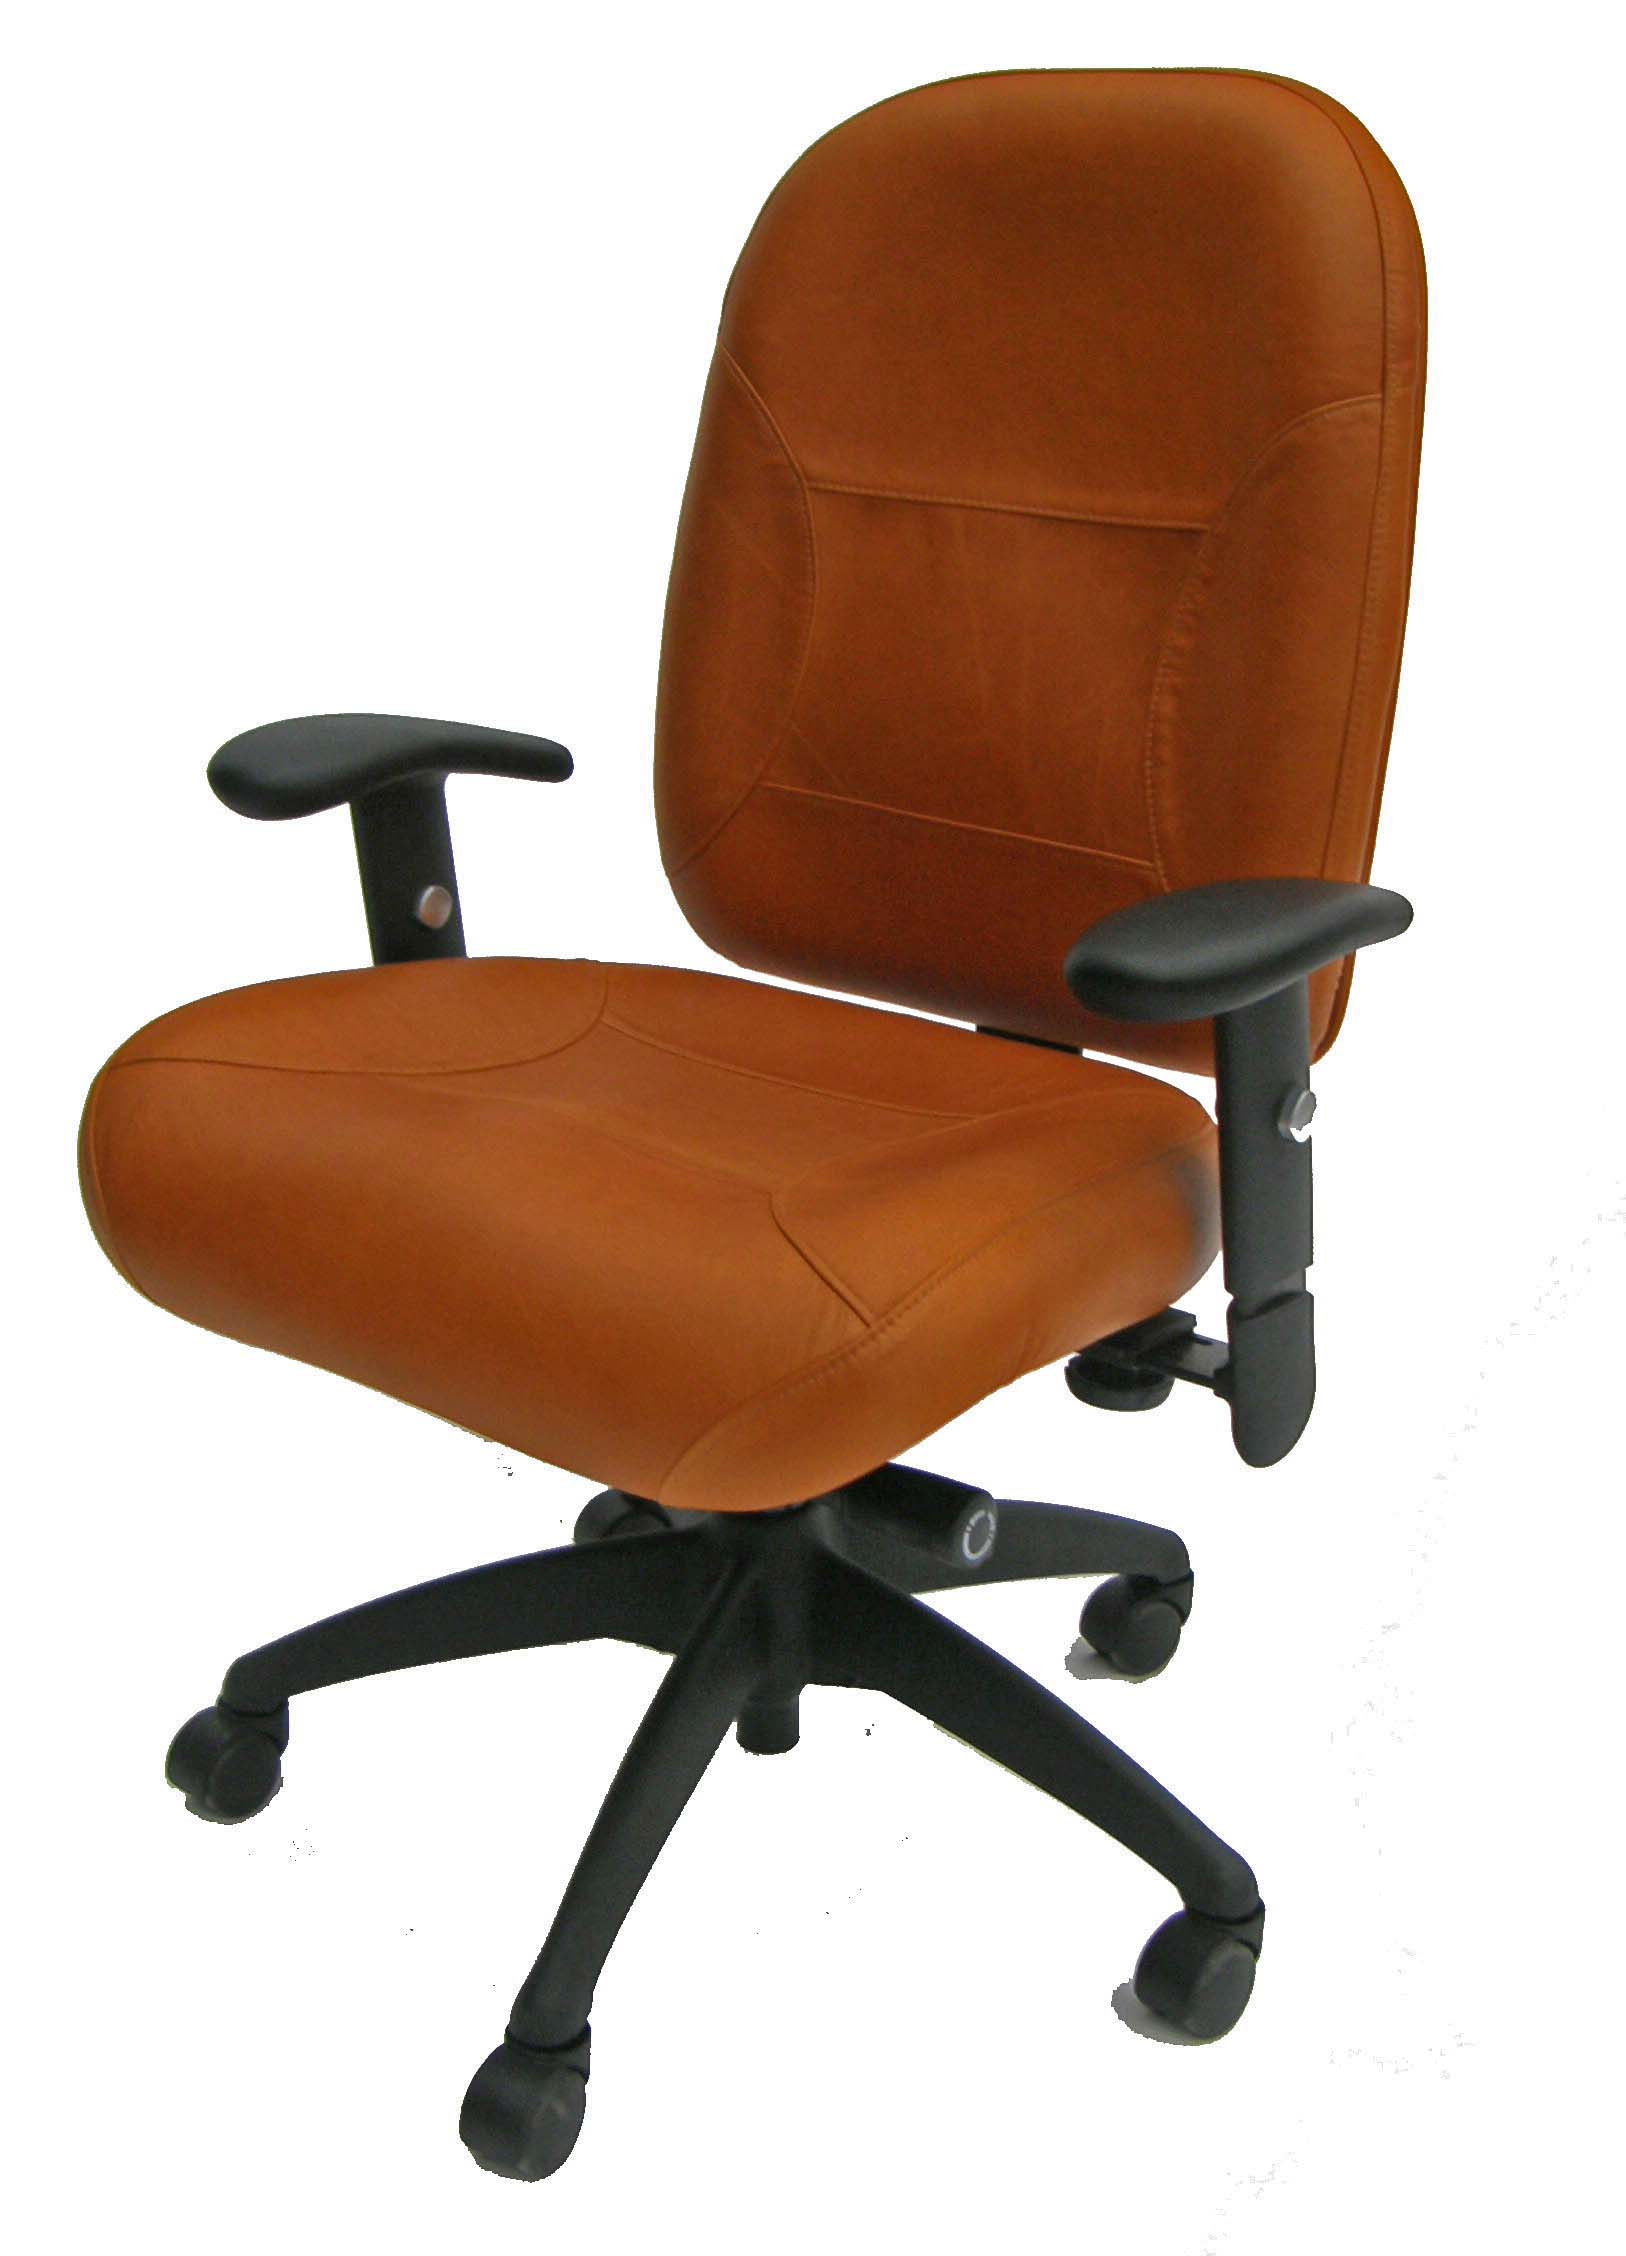 MVP Extreme Ergonomic Chair Glove Tan LEATHER - Champion ... e45d634315cbd